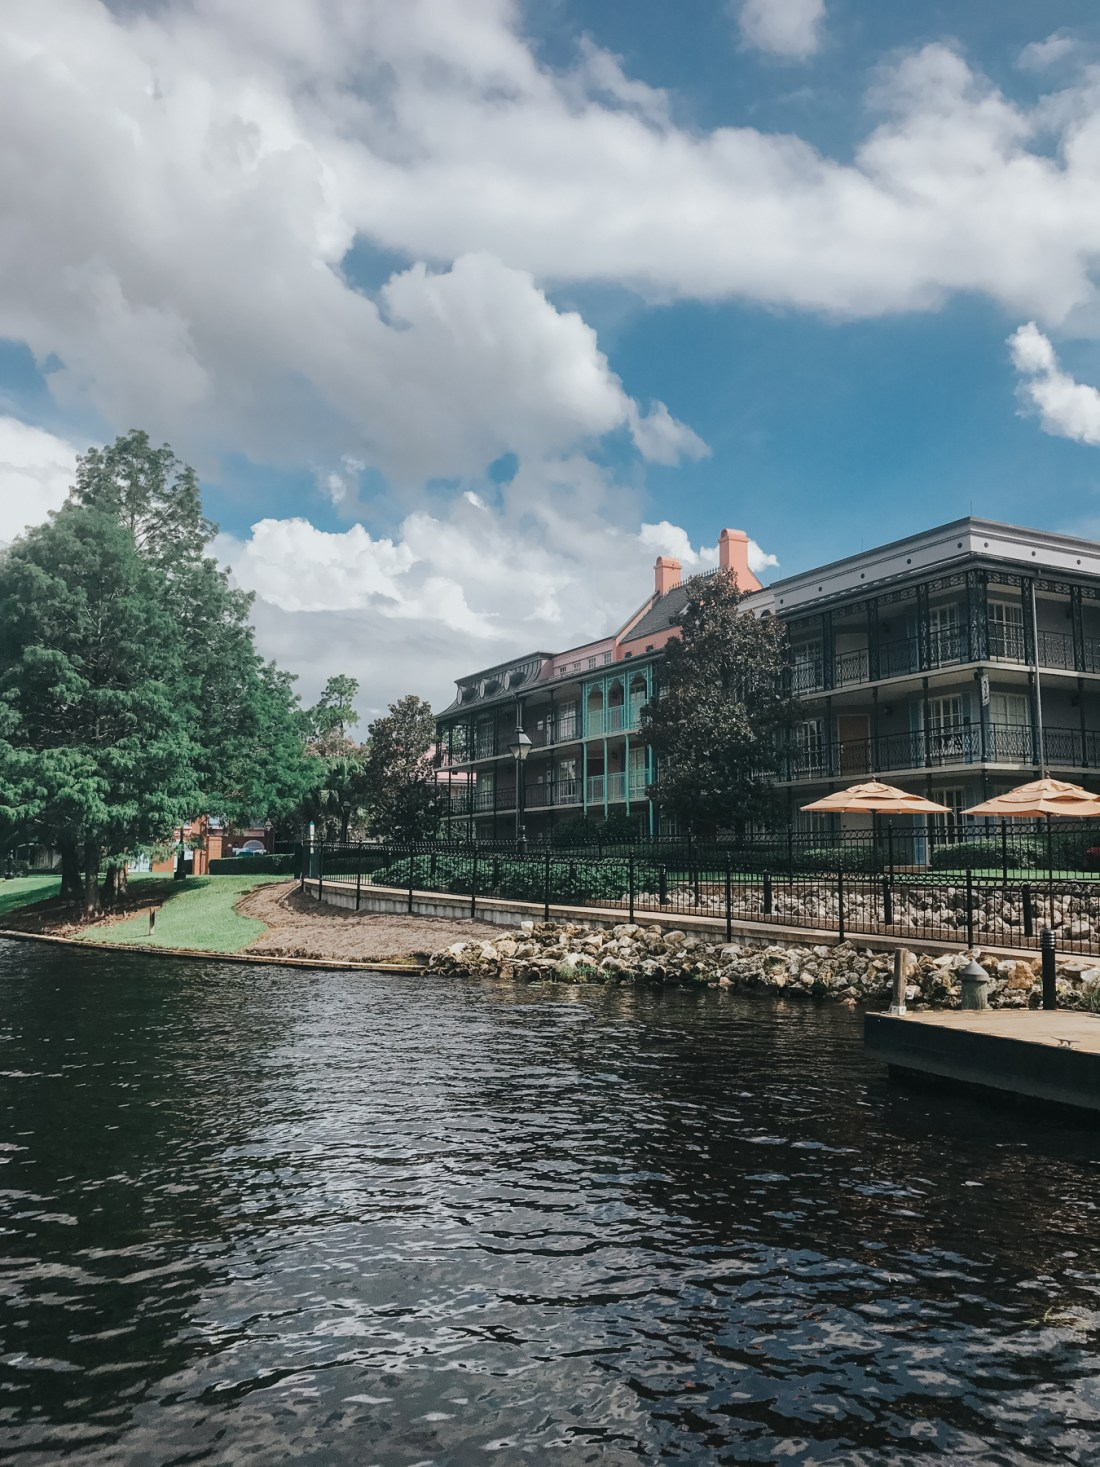 Disney's Port Orleans Resort - French Quarter, Disney Vacation, Disney Photography